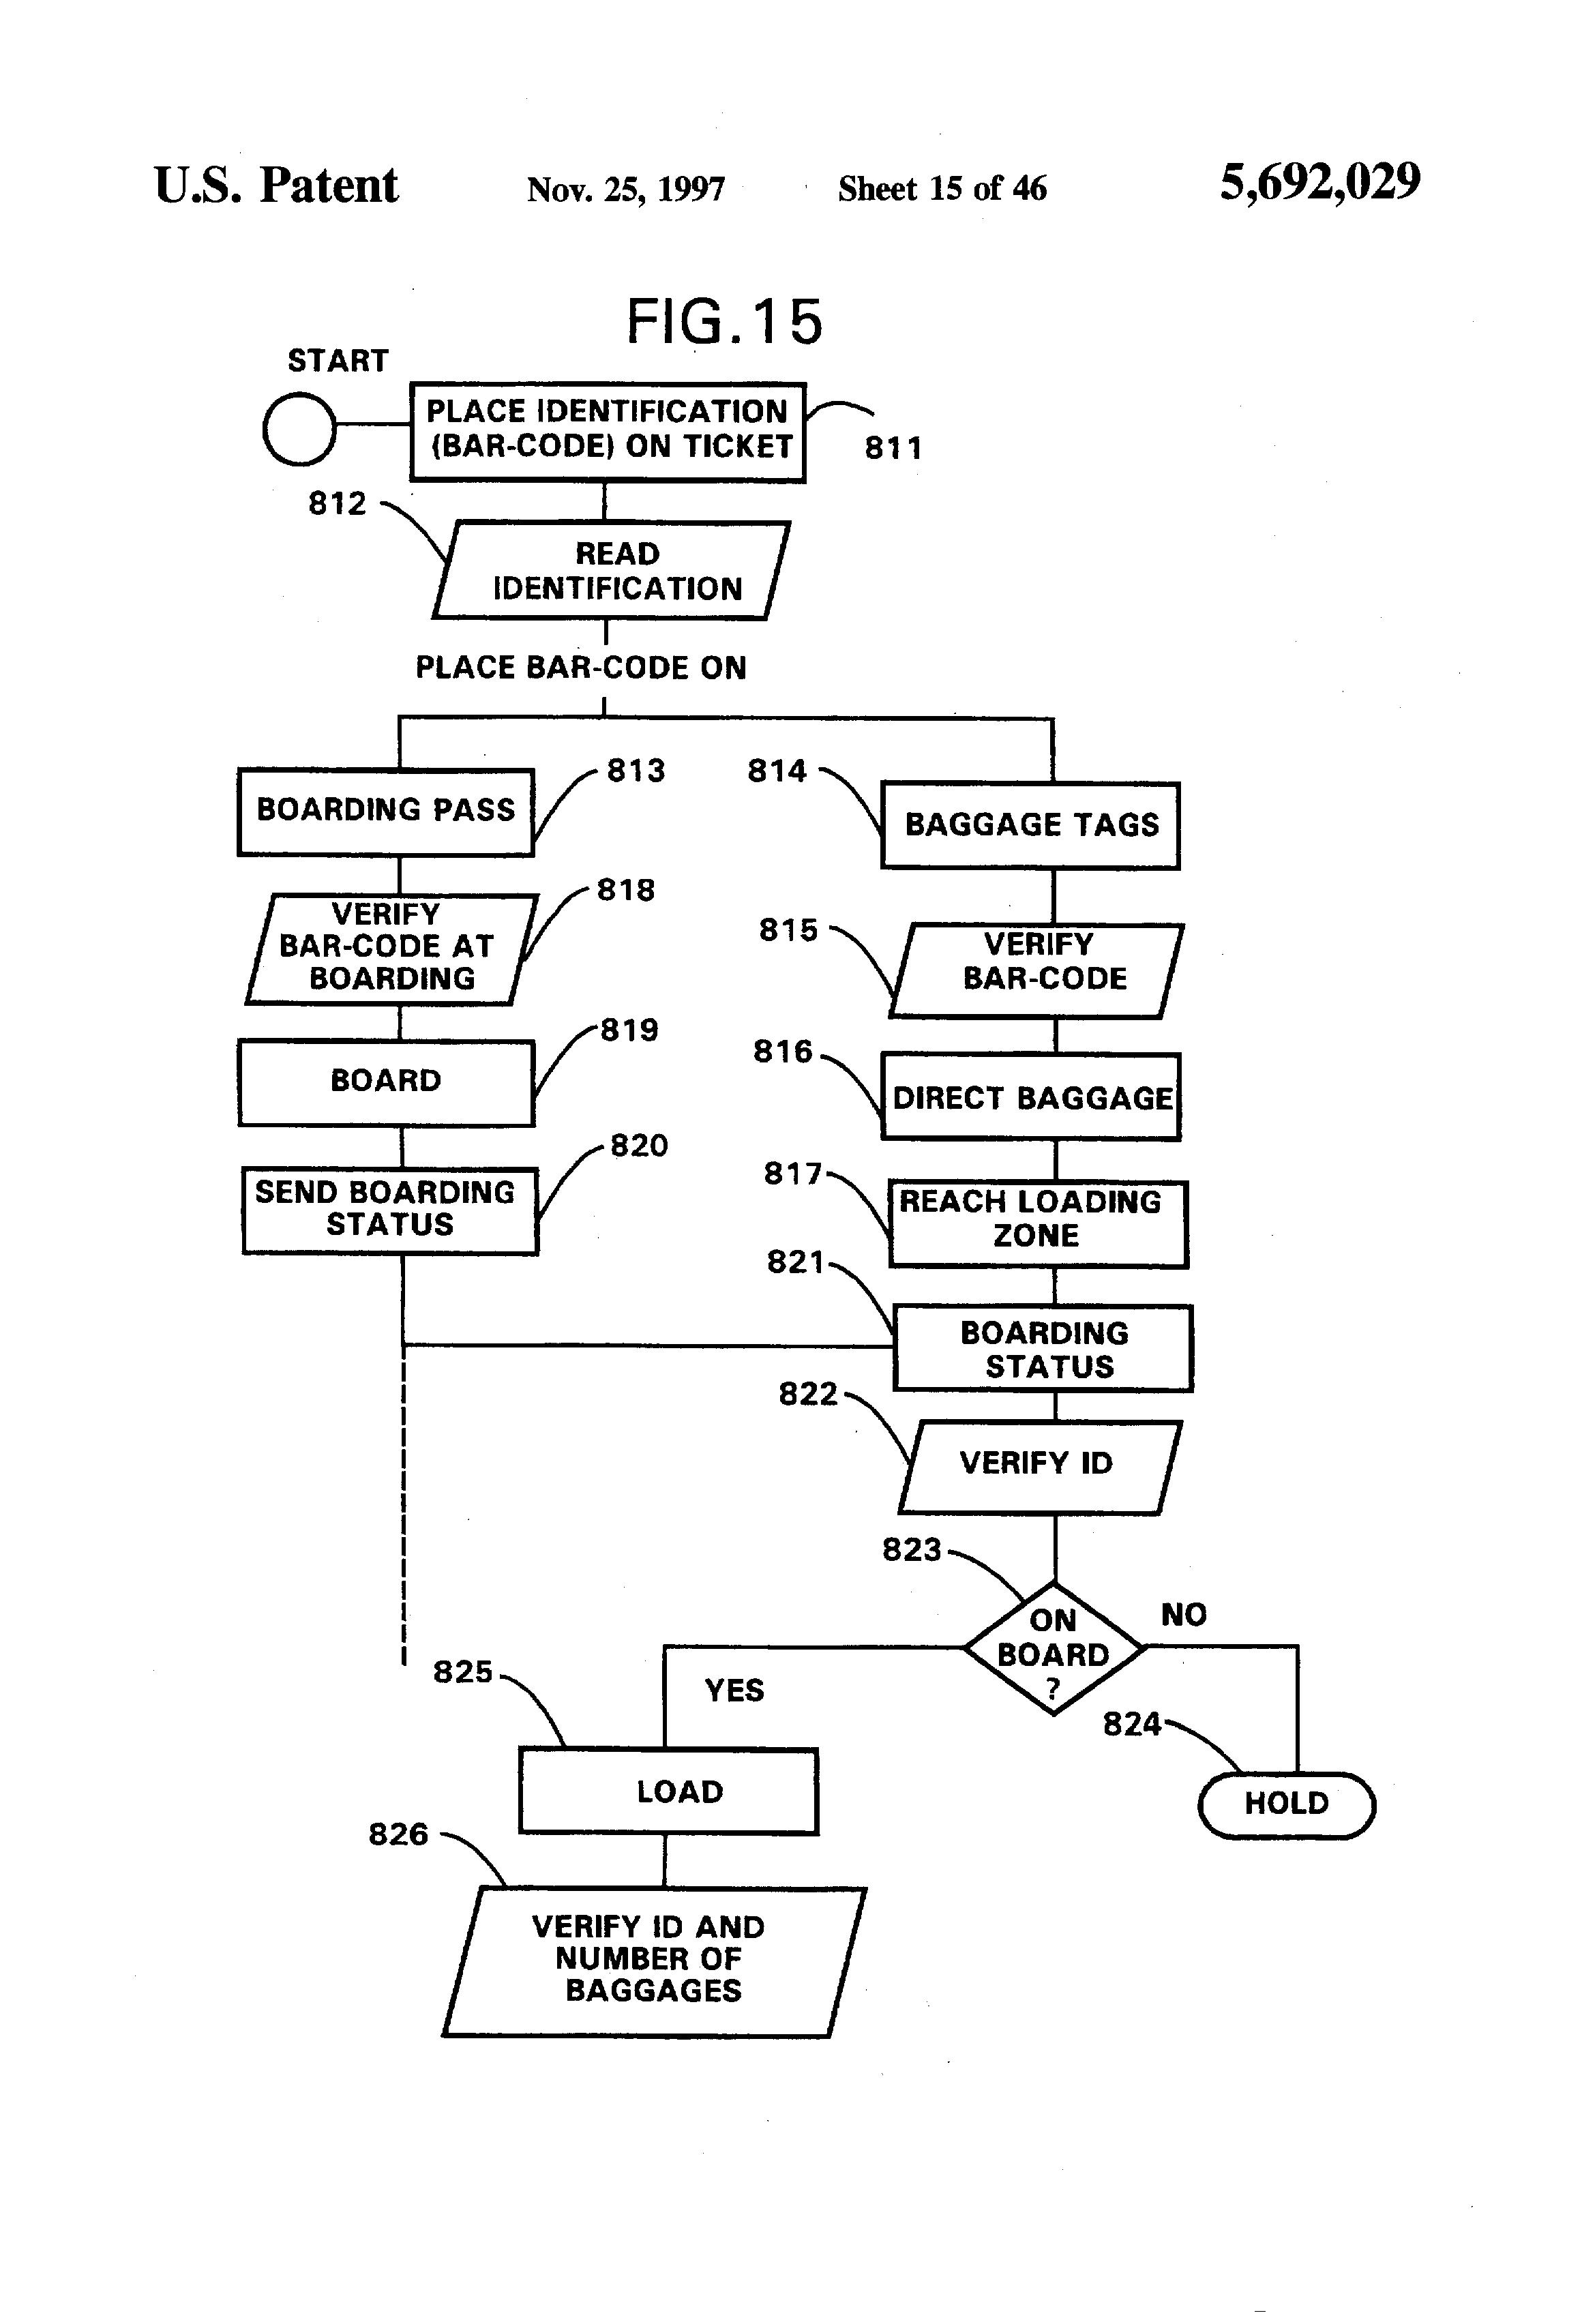 Wiring Diagram Kelistrikan Yamaha Vixion : Wiring diagram yamaha scorpio suzuki quadrunner parts